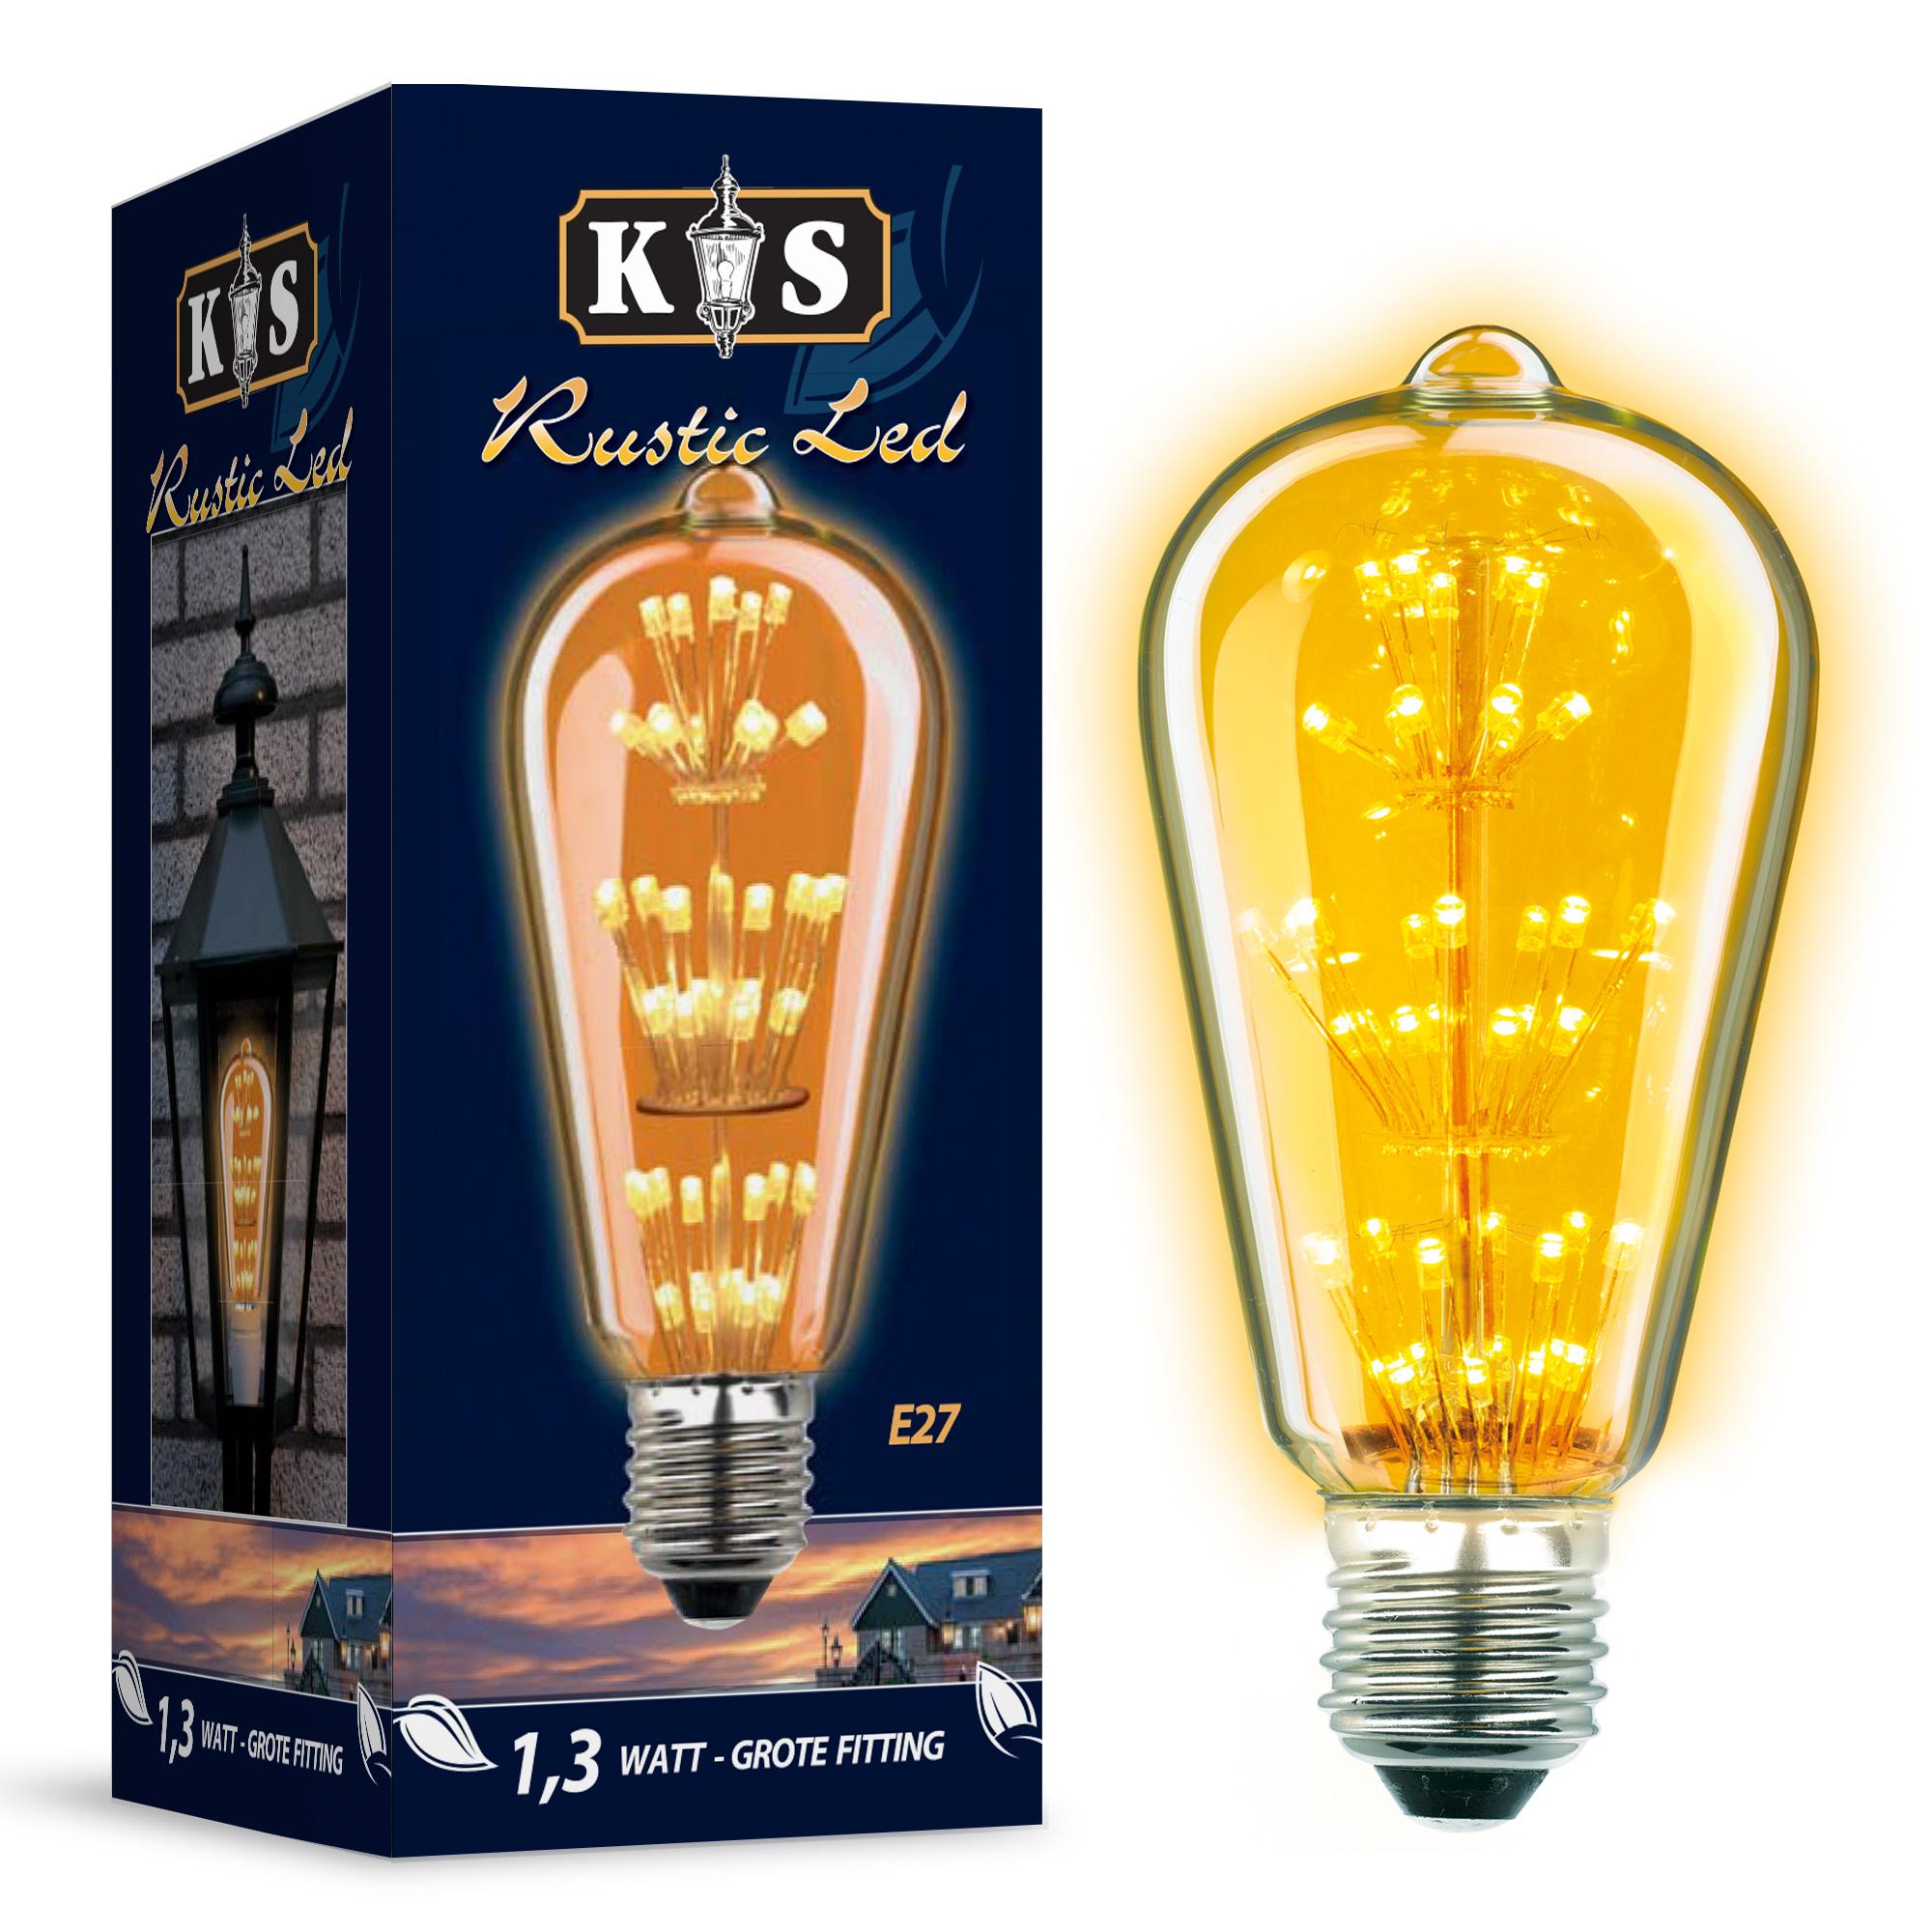 Rustic LED lamp